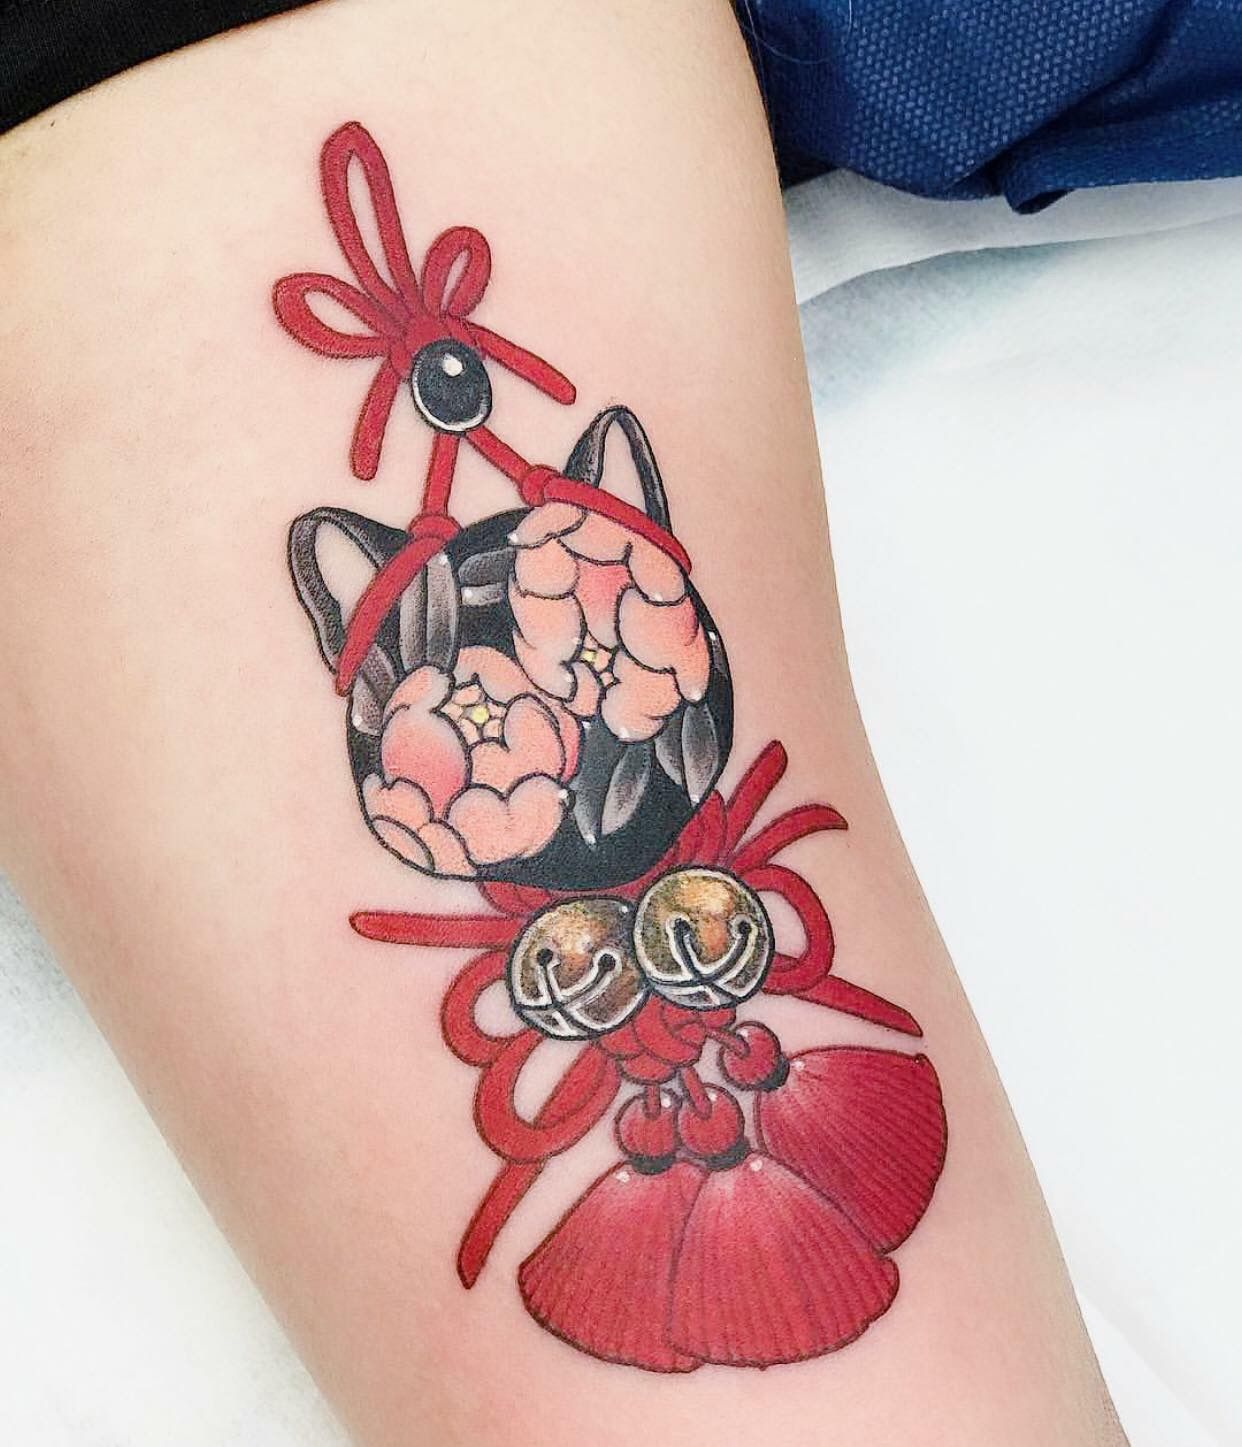 Kitten Hand Tattoos Sleeve Tattoos For Women Tattoo Designs